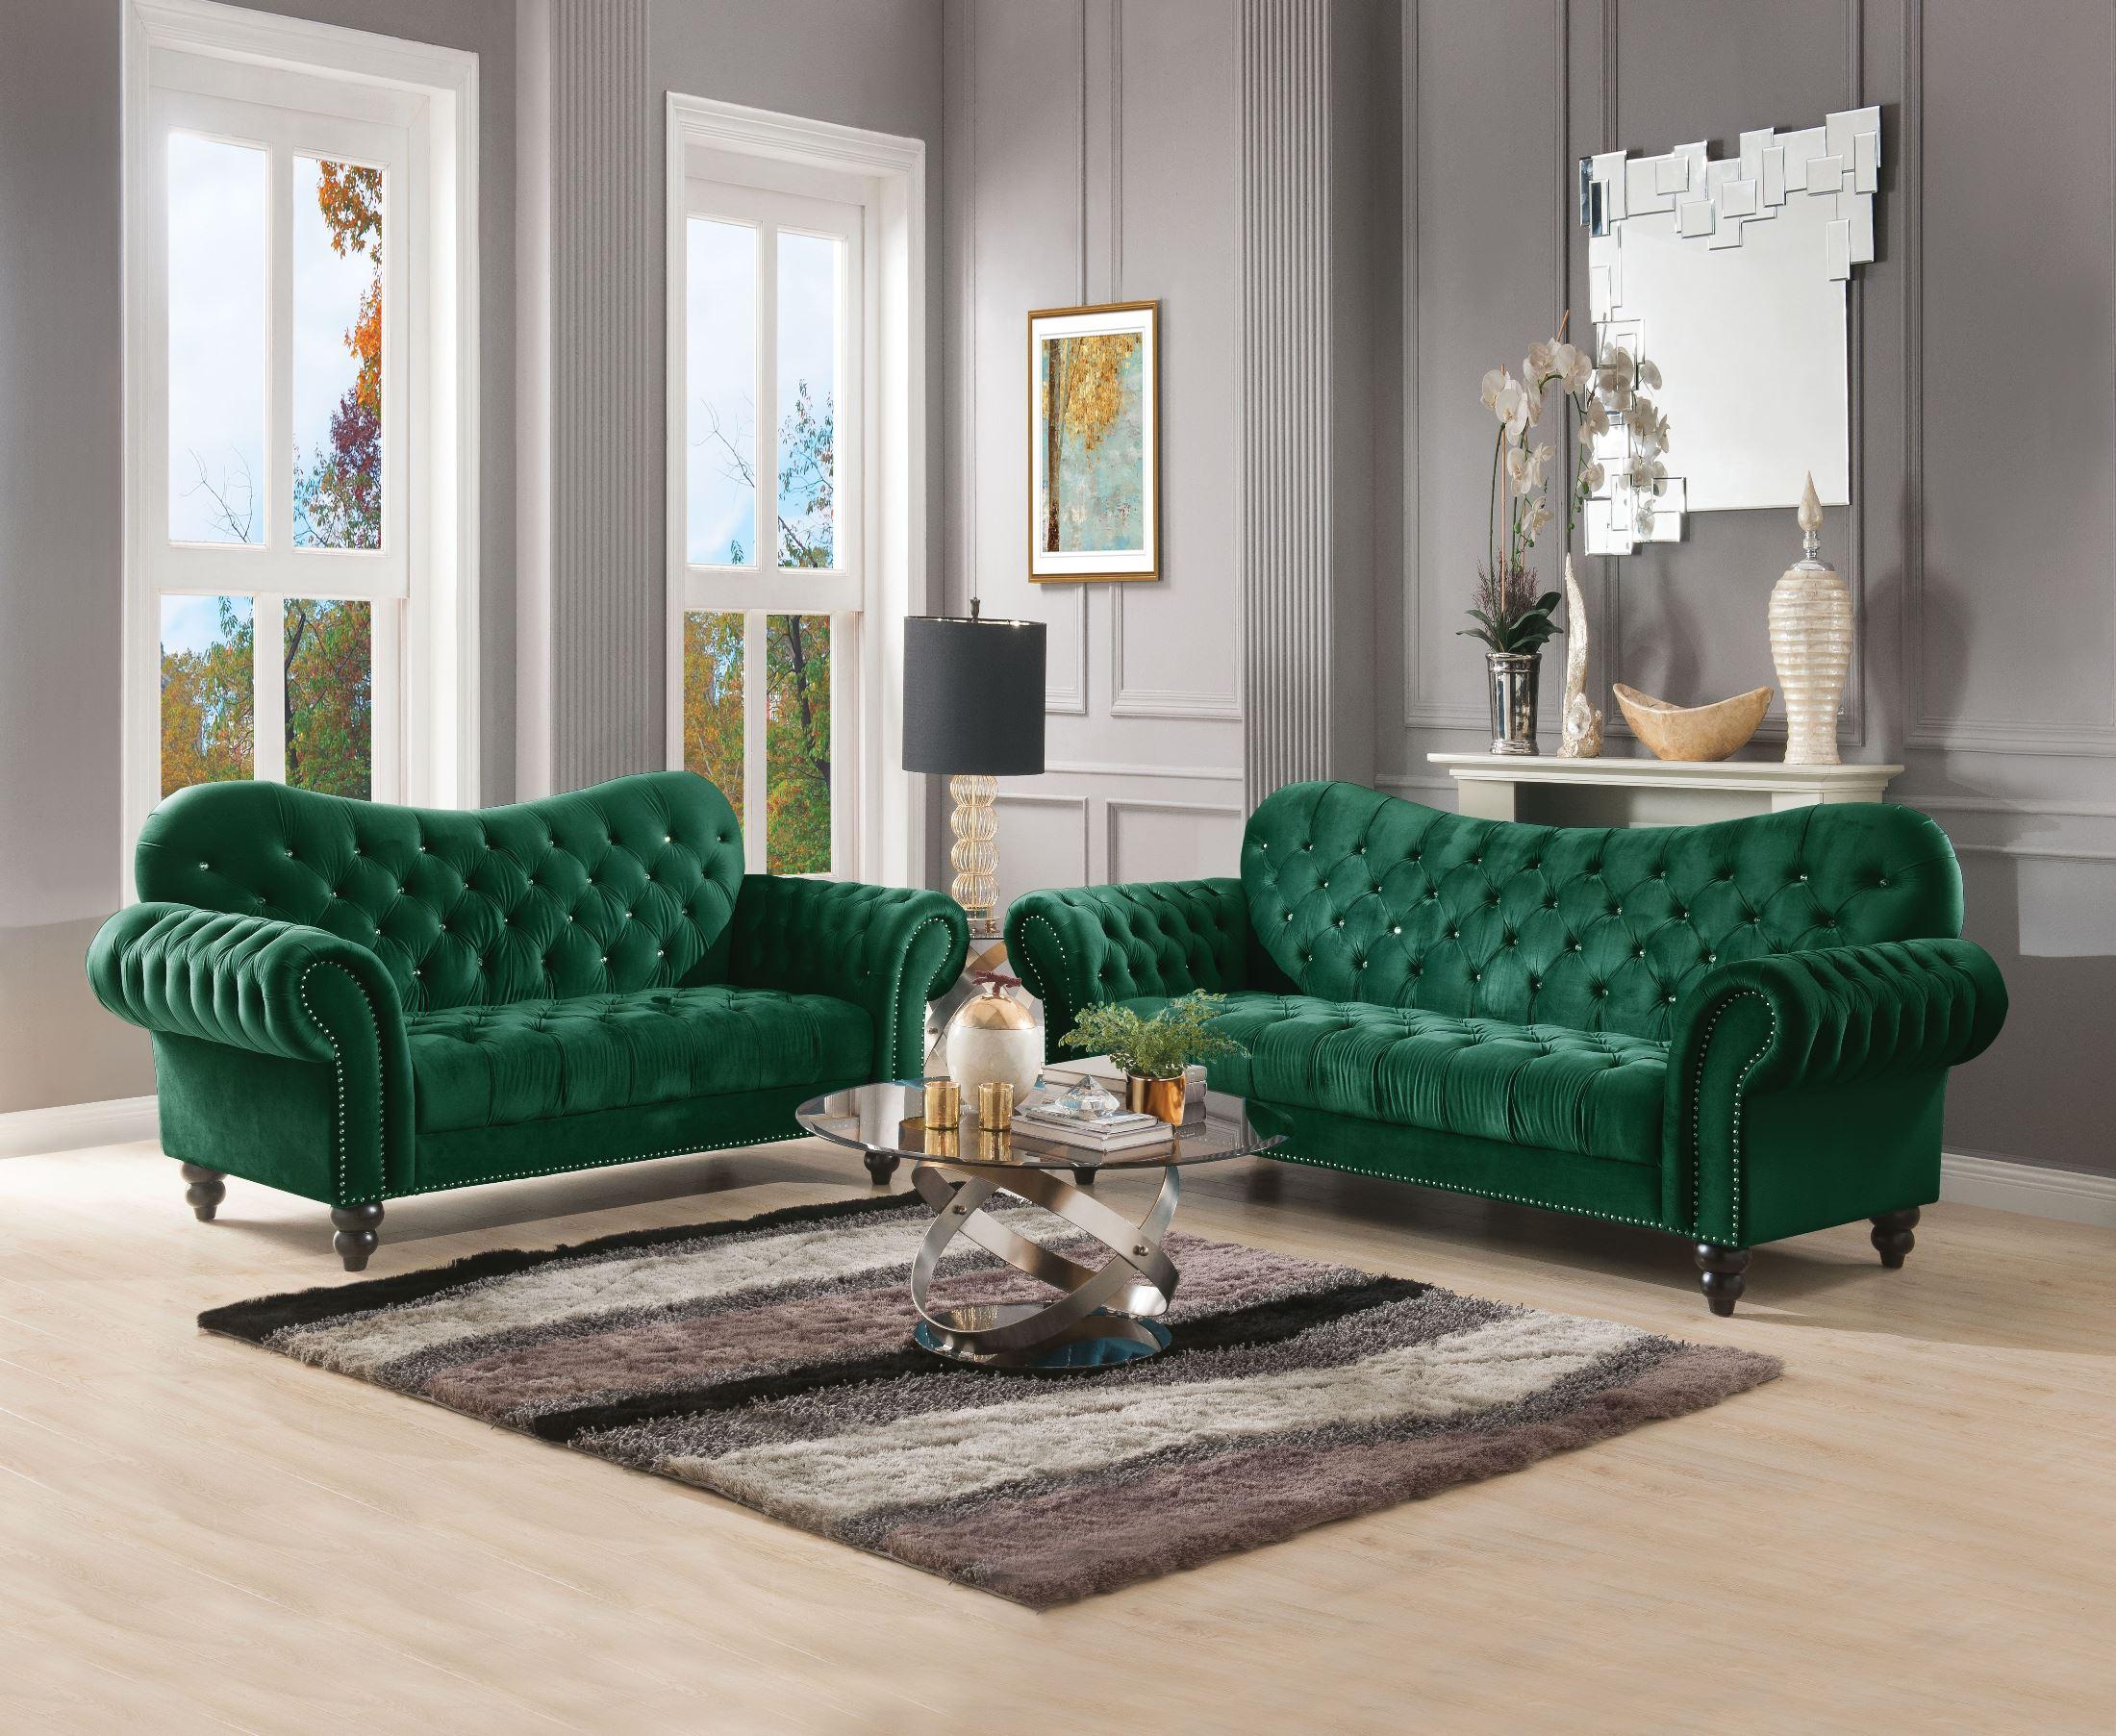 Acme Iberis Green Velvet Living Room Set Iberis Collection 5